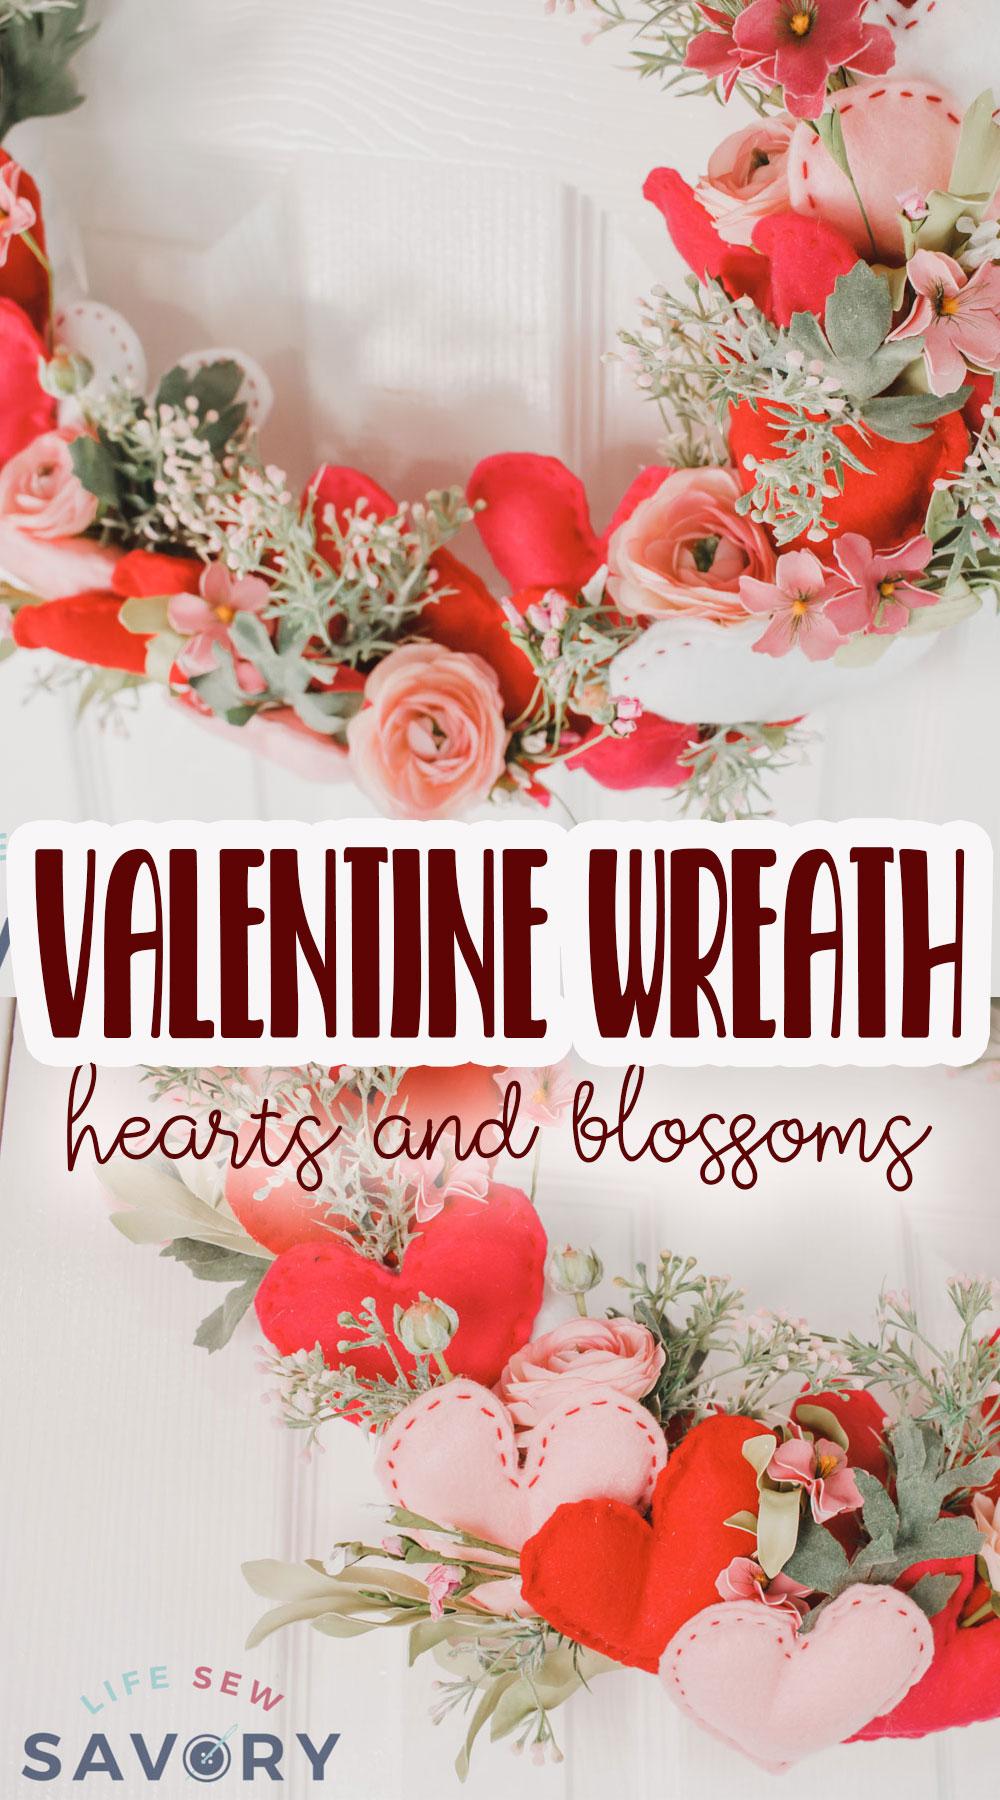 diy valentines wreath crafting tutorial